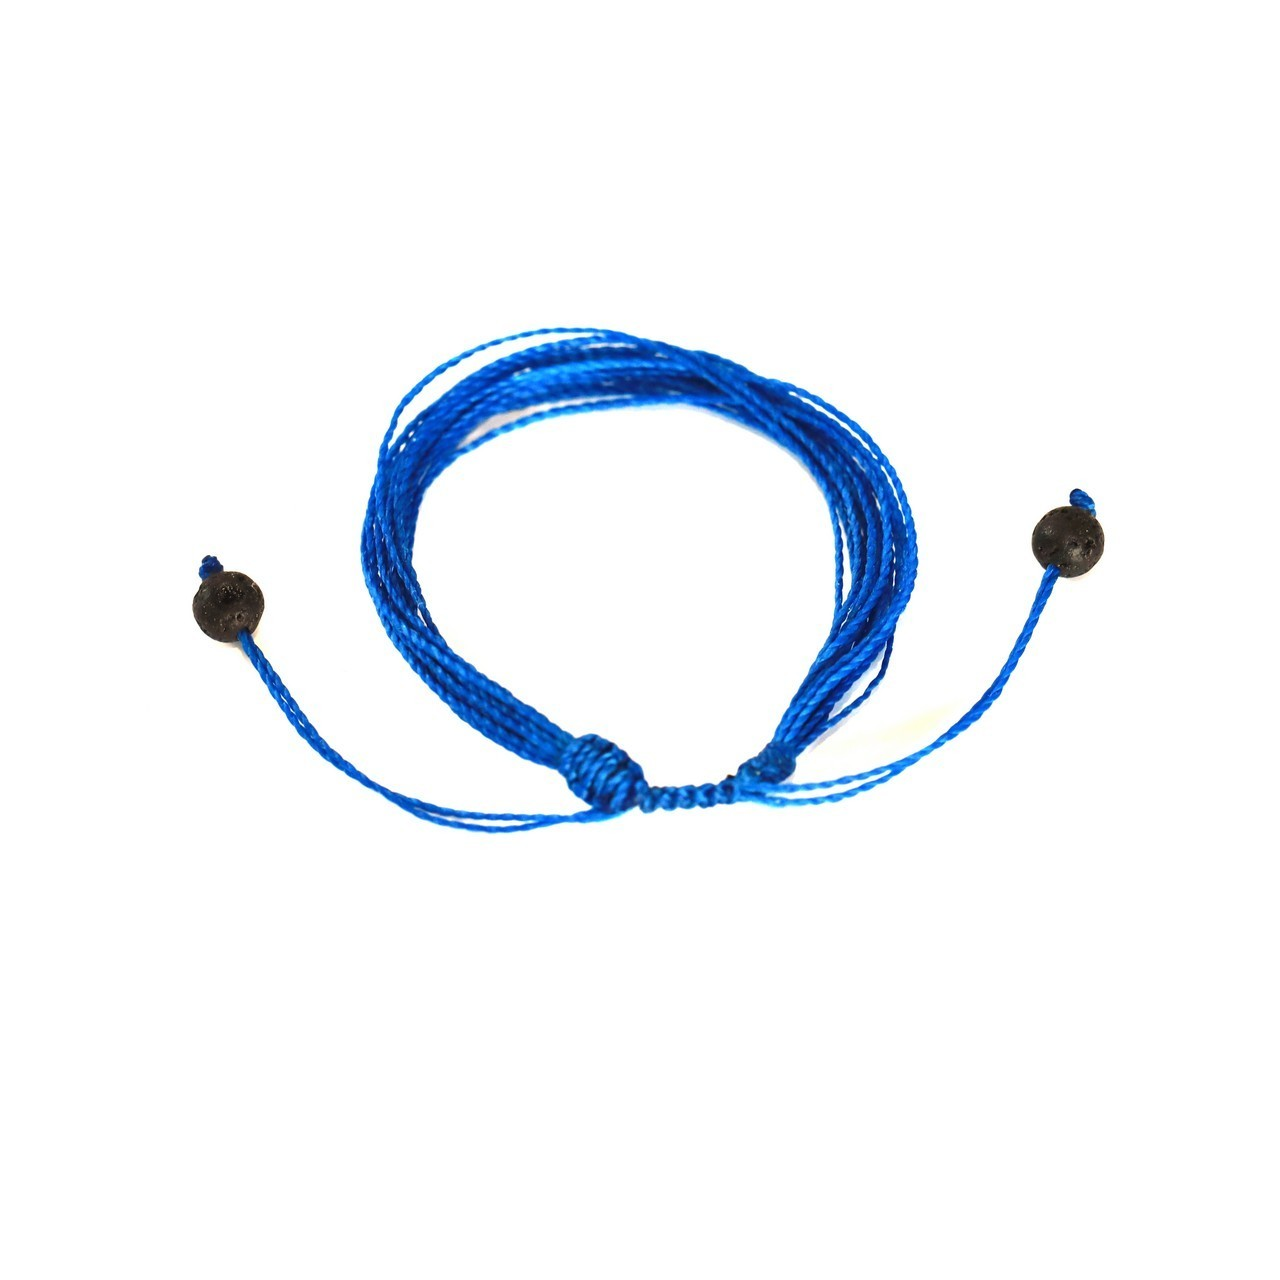 Hyped Diffuser Bracelet